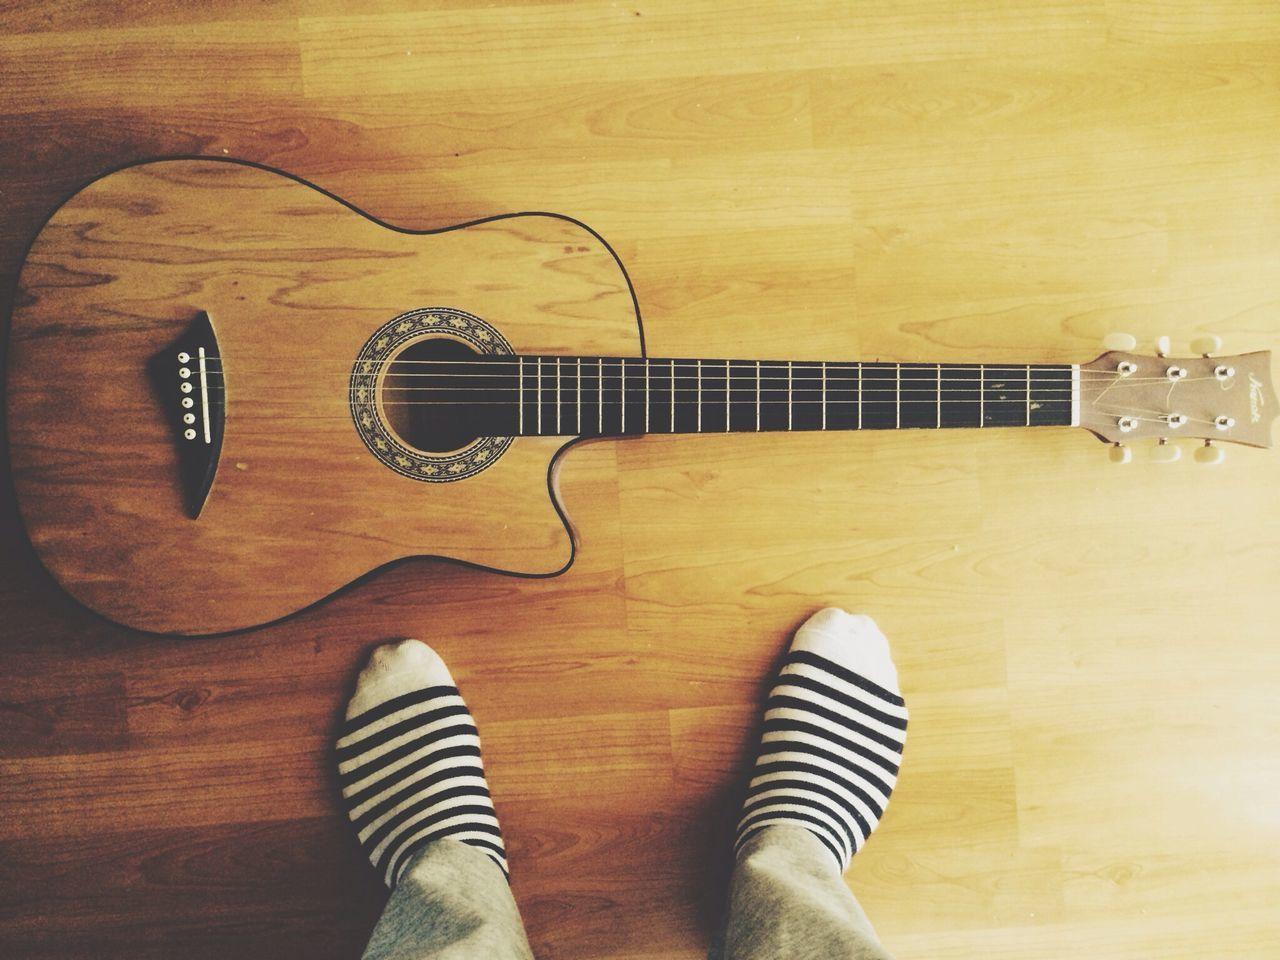 Beautiful stock photos of guitar, Arts Culture And Entertainment, Floor, Guitar, Human Foot